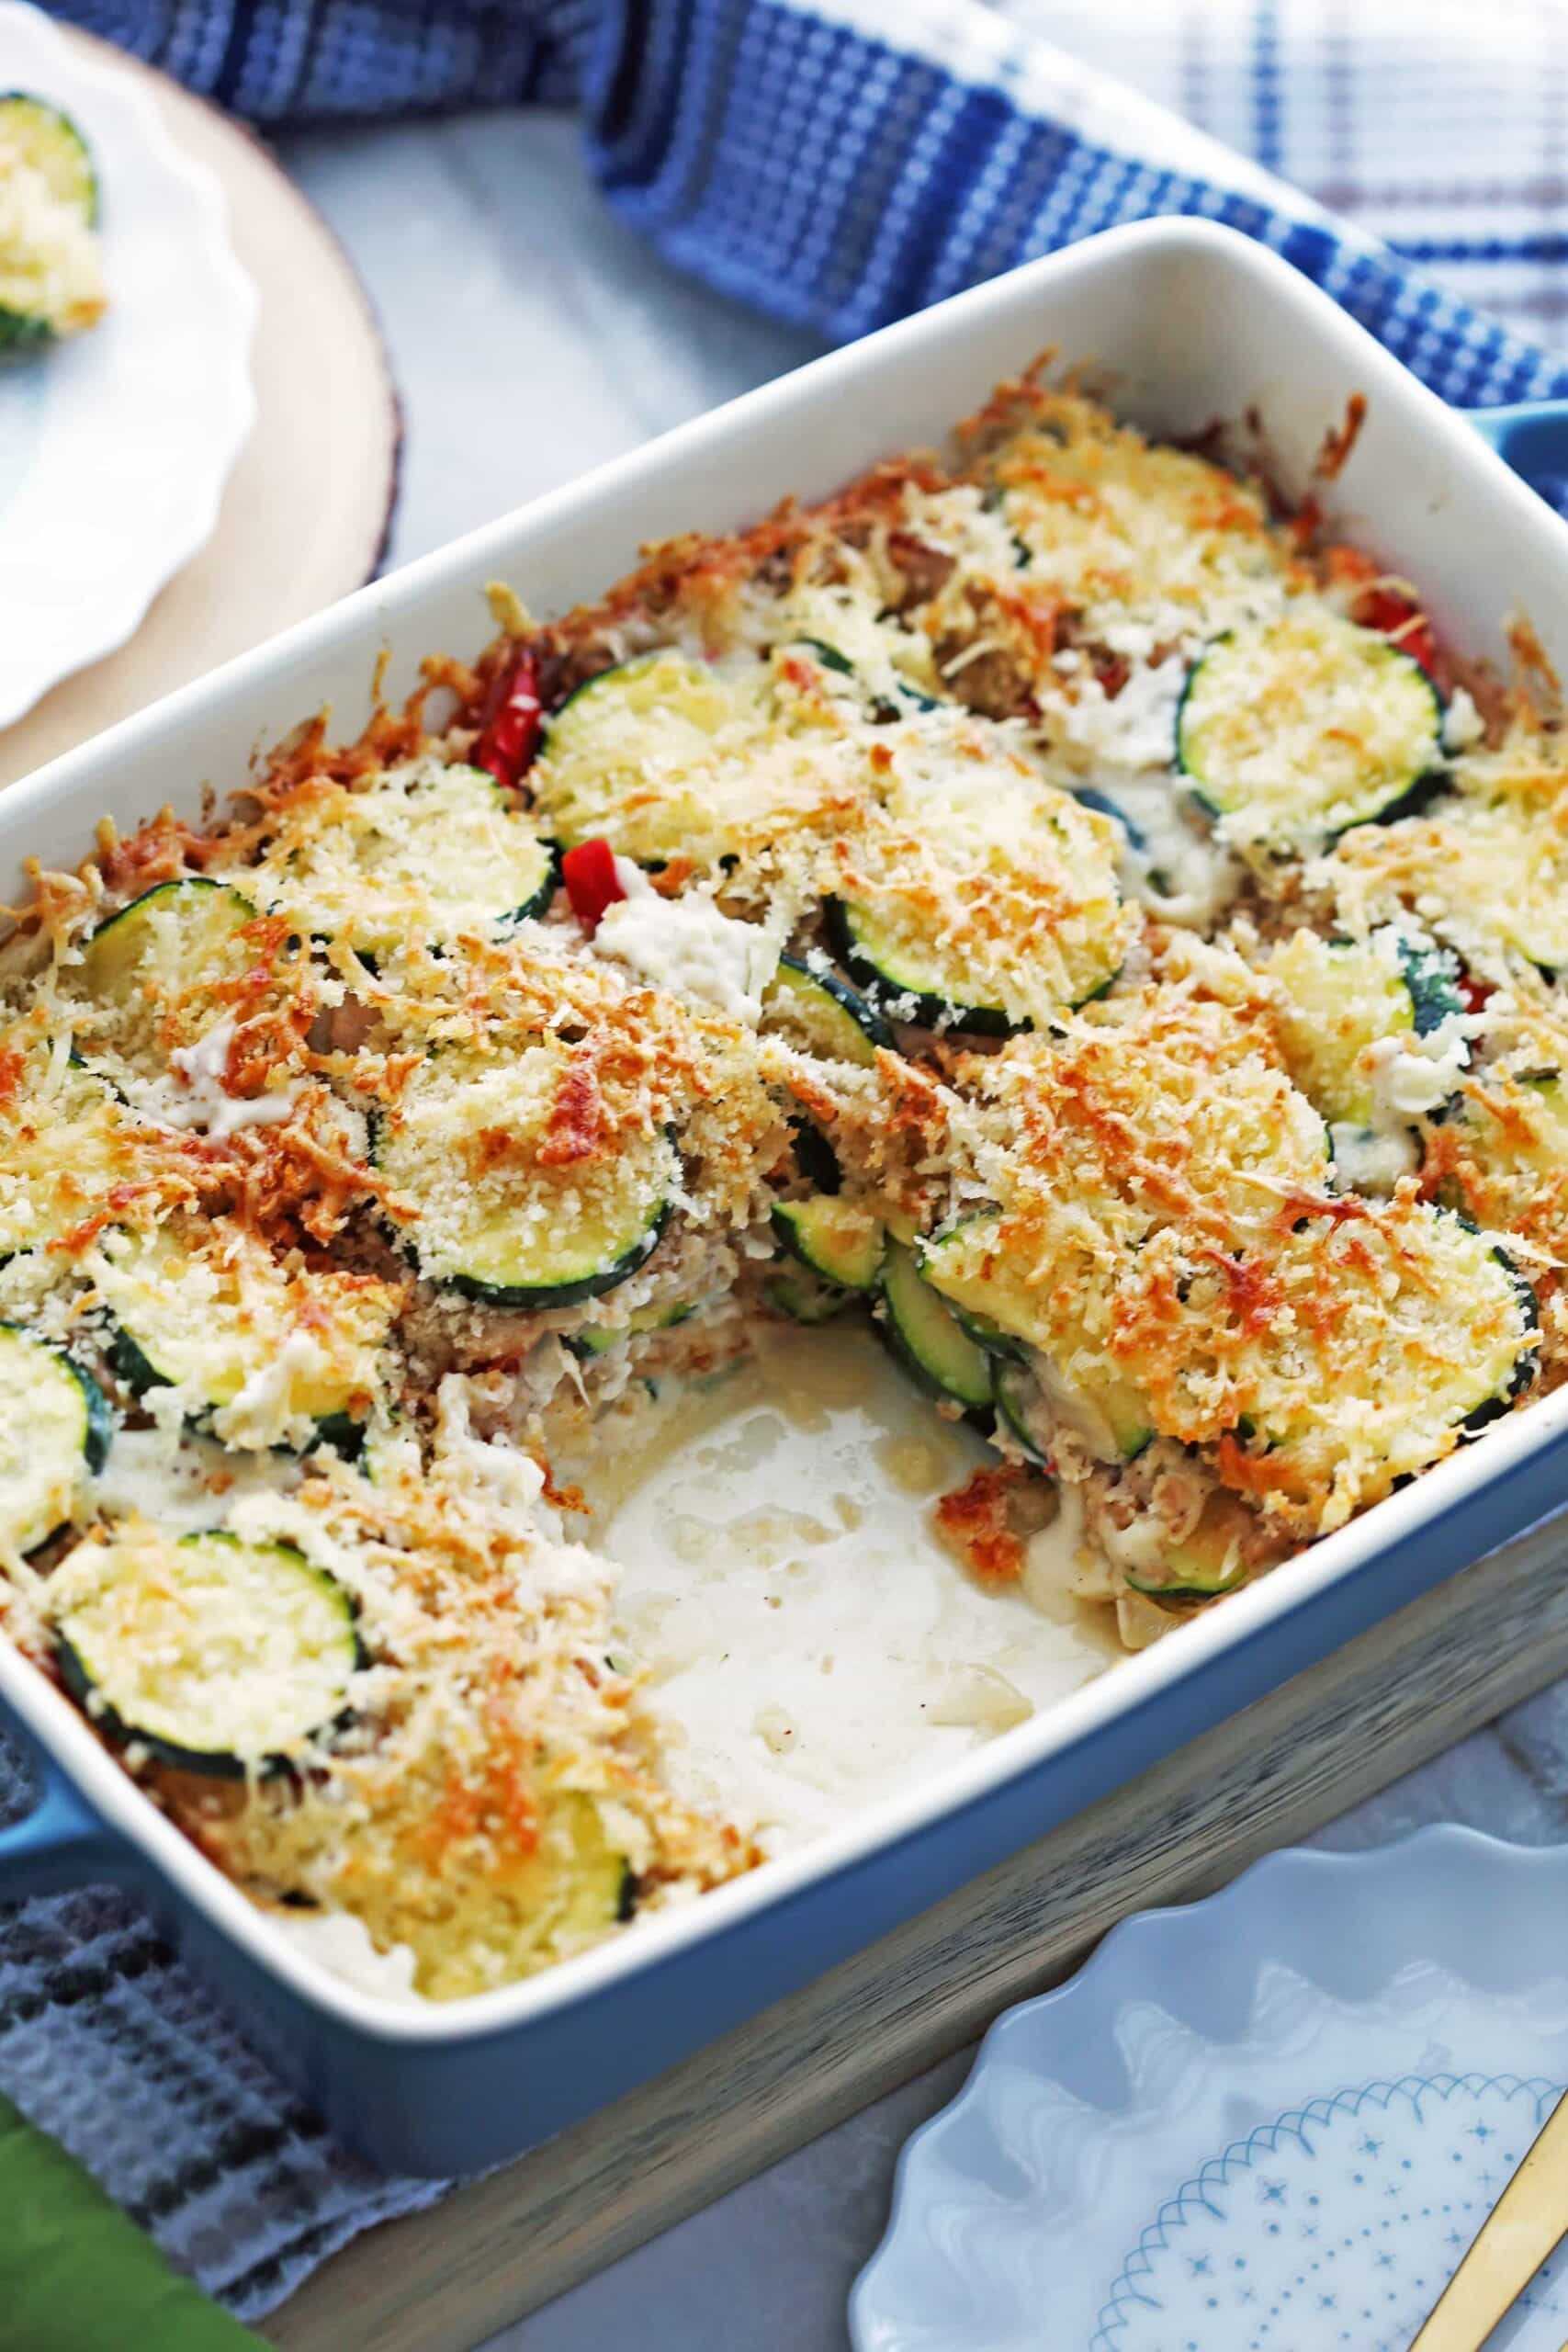 Zucchini Gratin with Gruyère and Panko Breadcrumbs